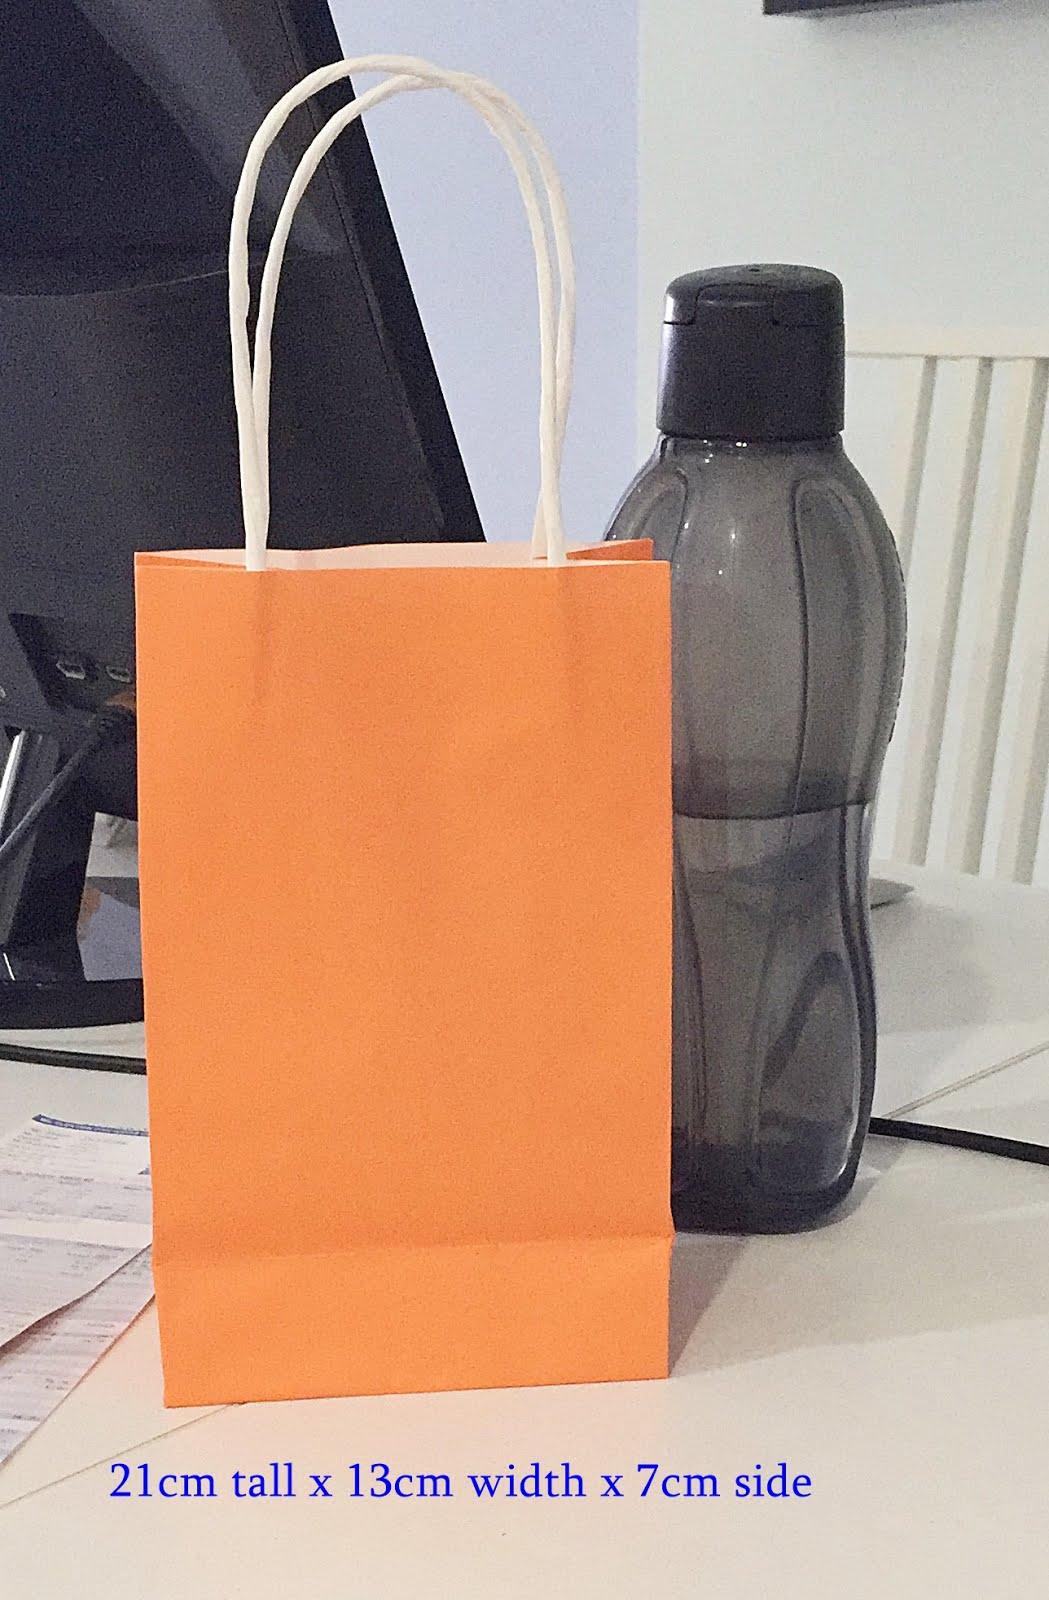 Paper Bags 21cm tall x 13cm width x 7cm side